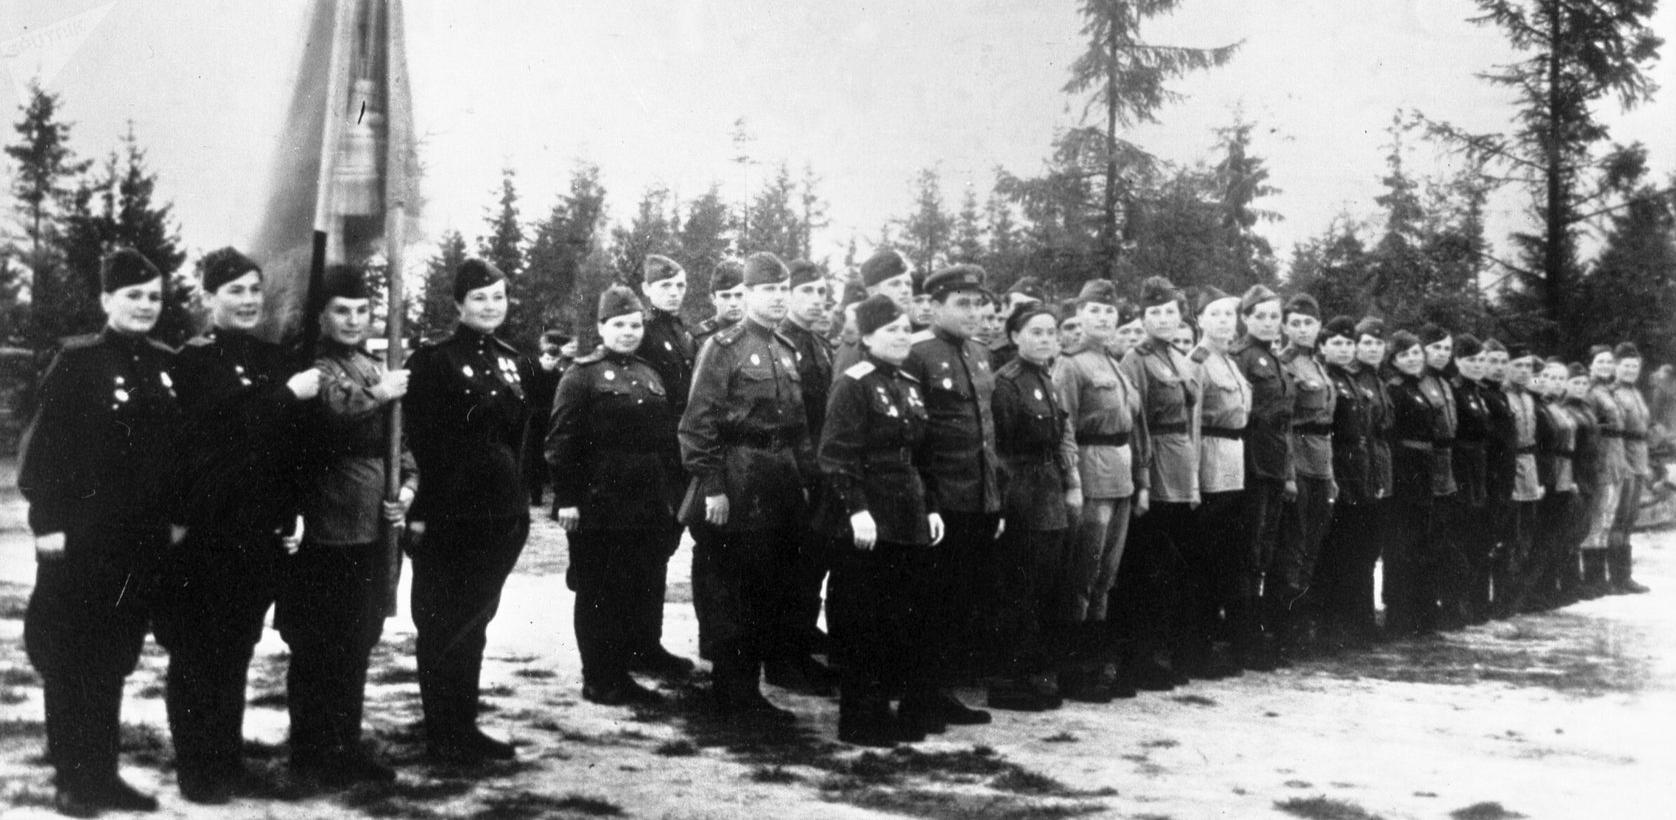 Des pilotes de l'époque de la Grande Guerre patriotique